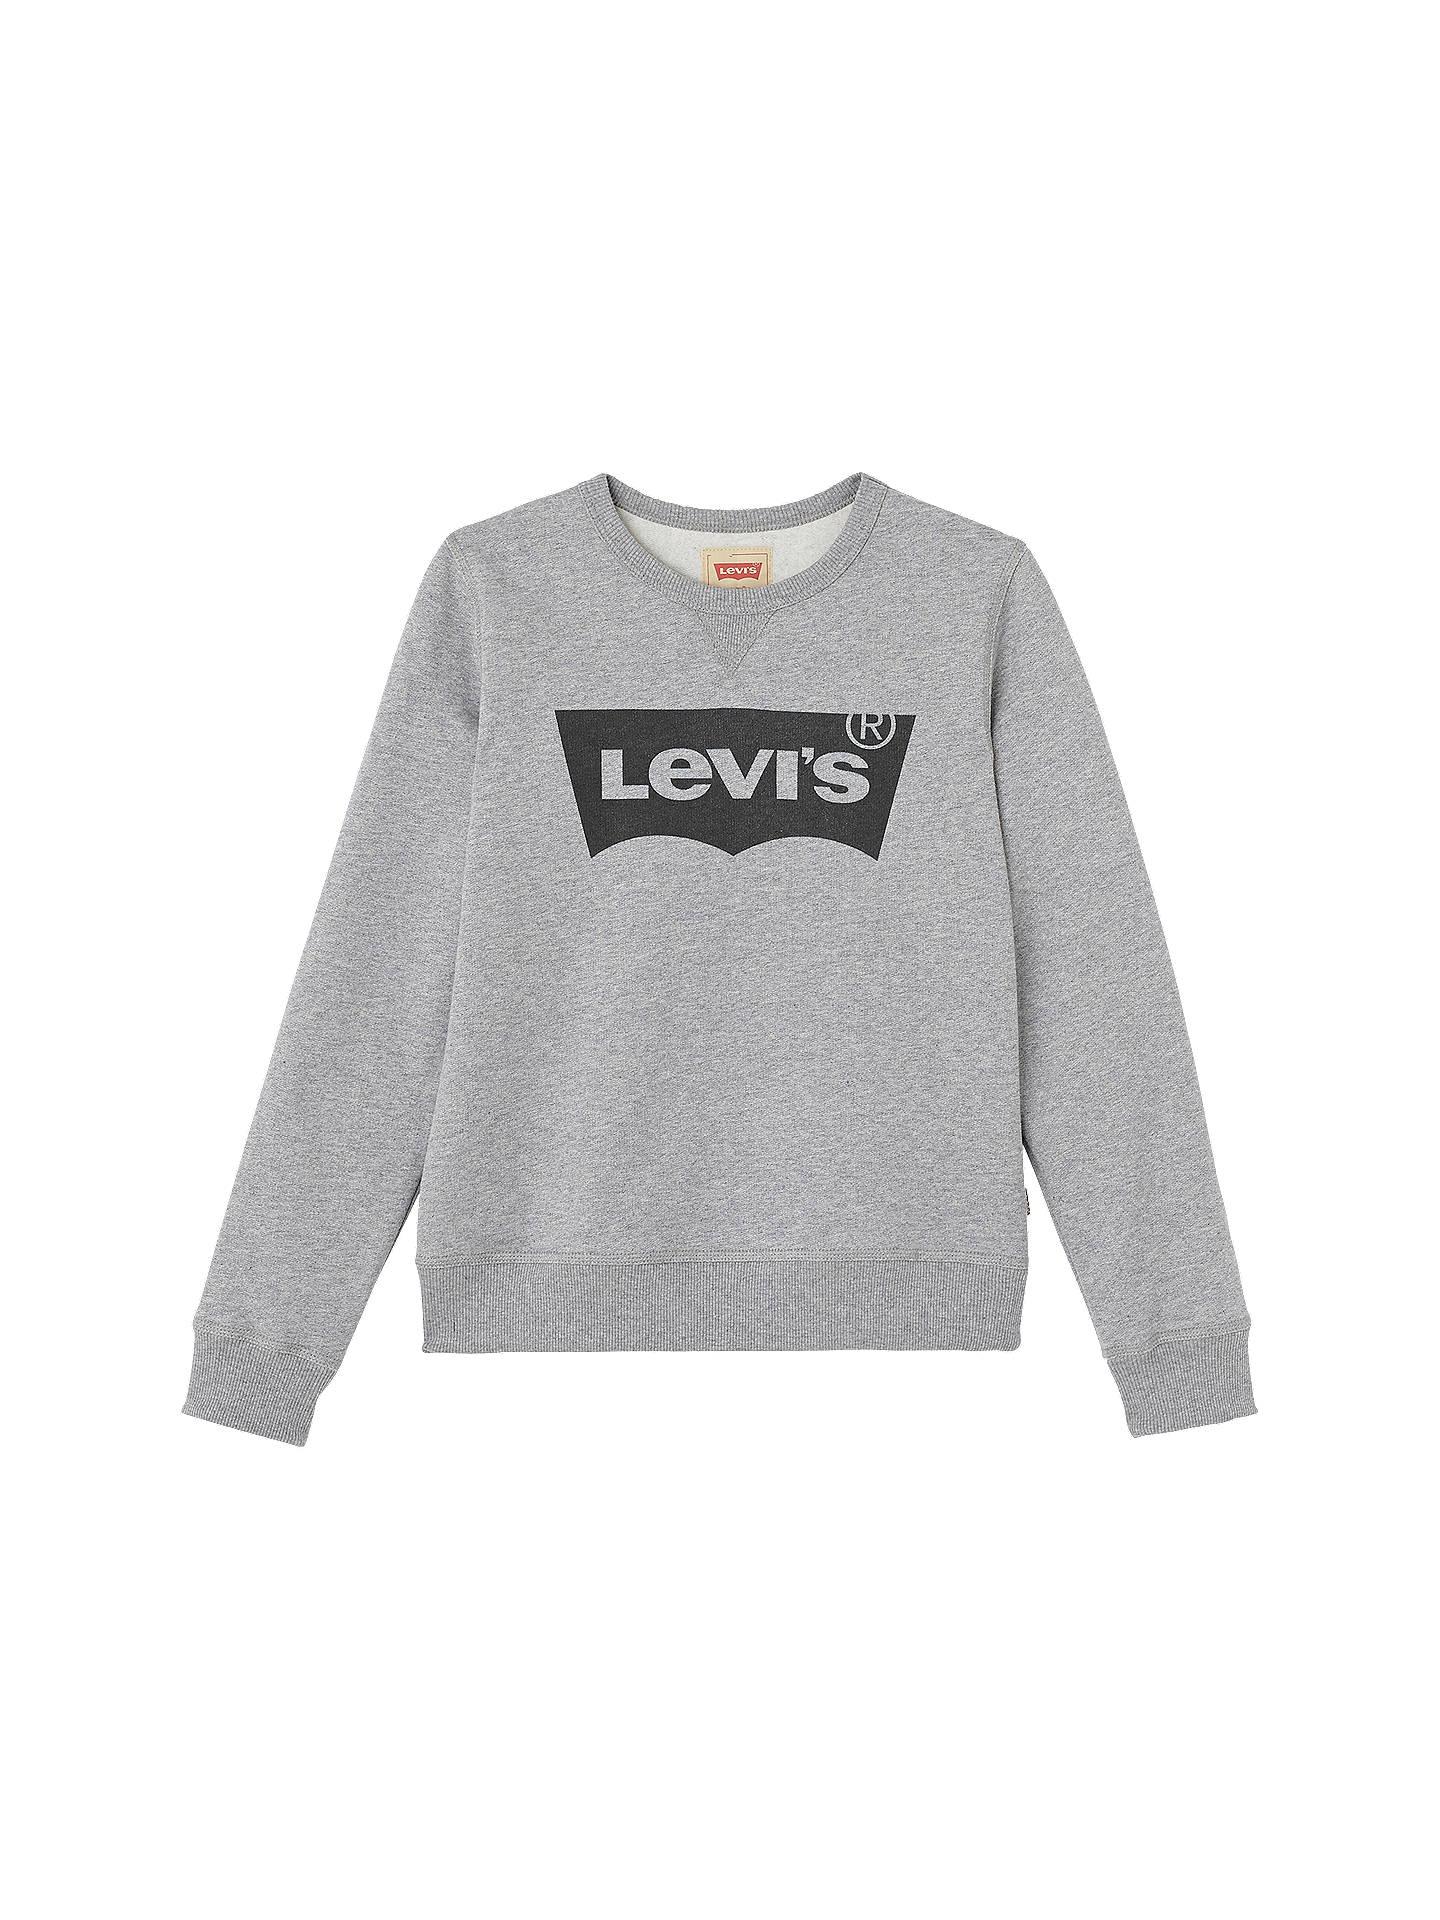 Levi's Boys' Batwing Logo Print Sweatshirt, Grey at John